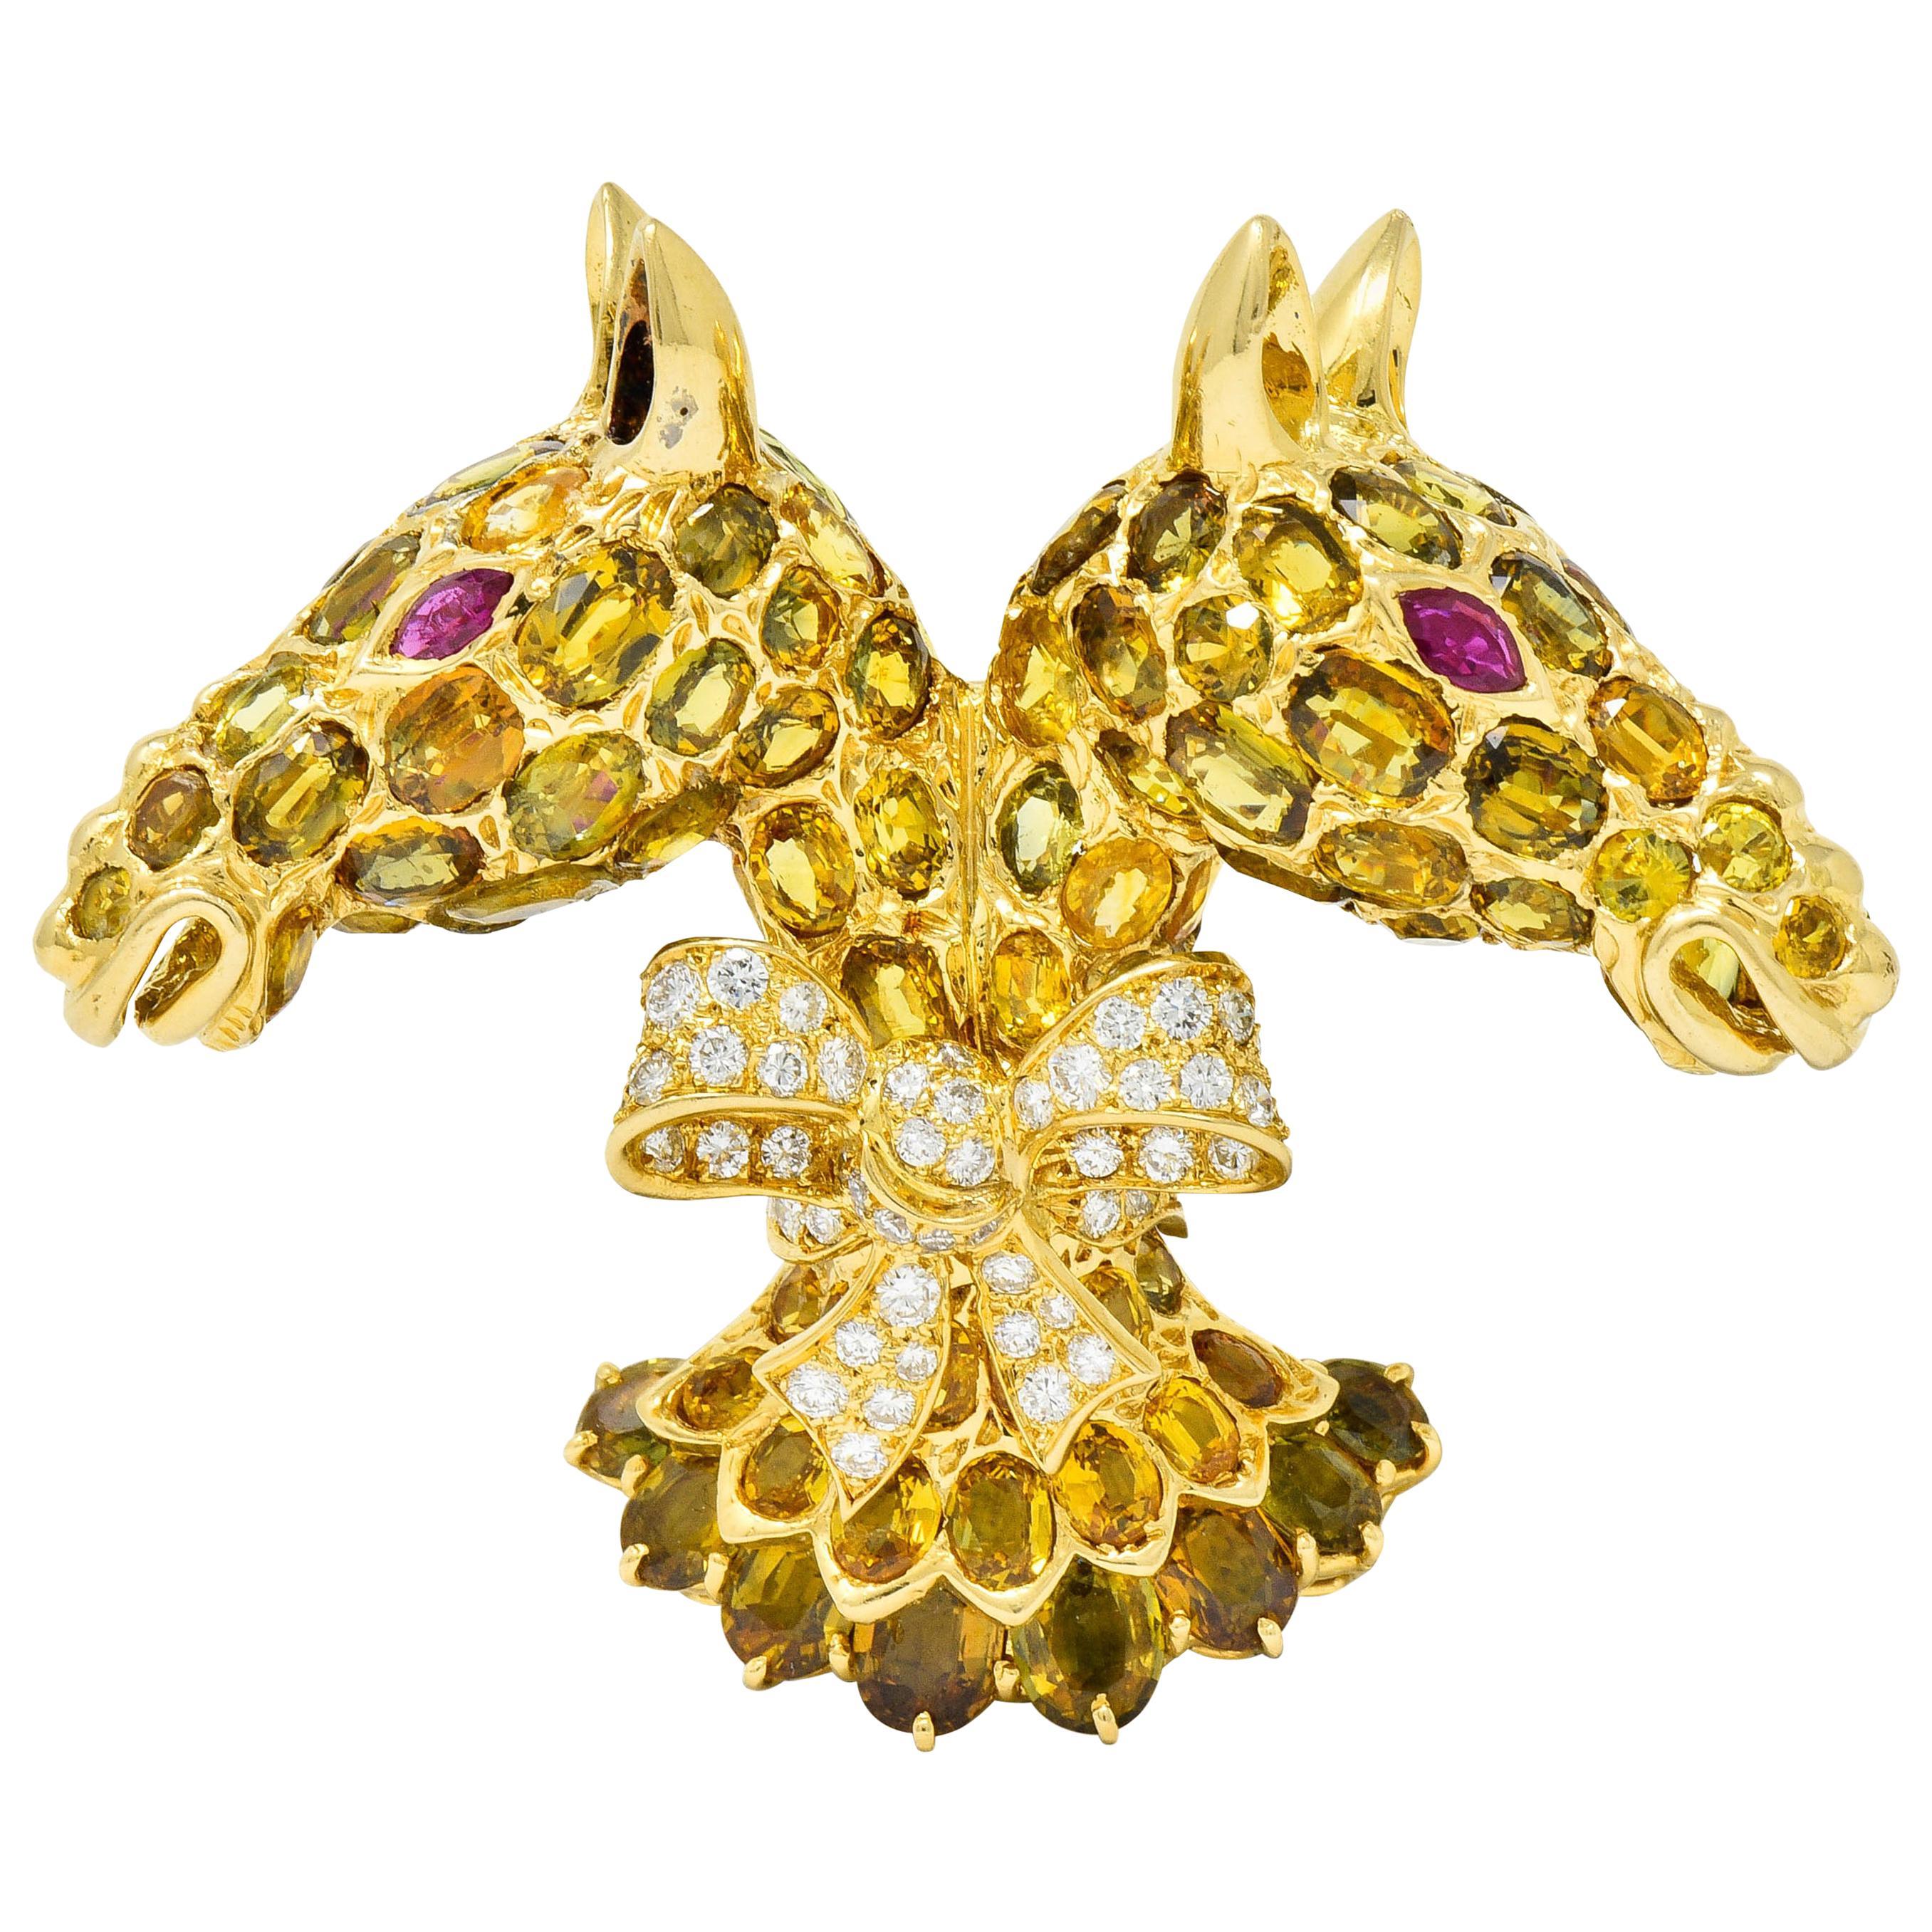 Tiffany & Co. Ruby Sapphire Diamond 18 Karat Gold Giraffe Brooch